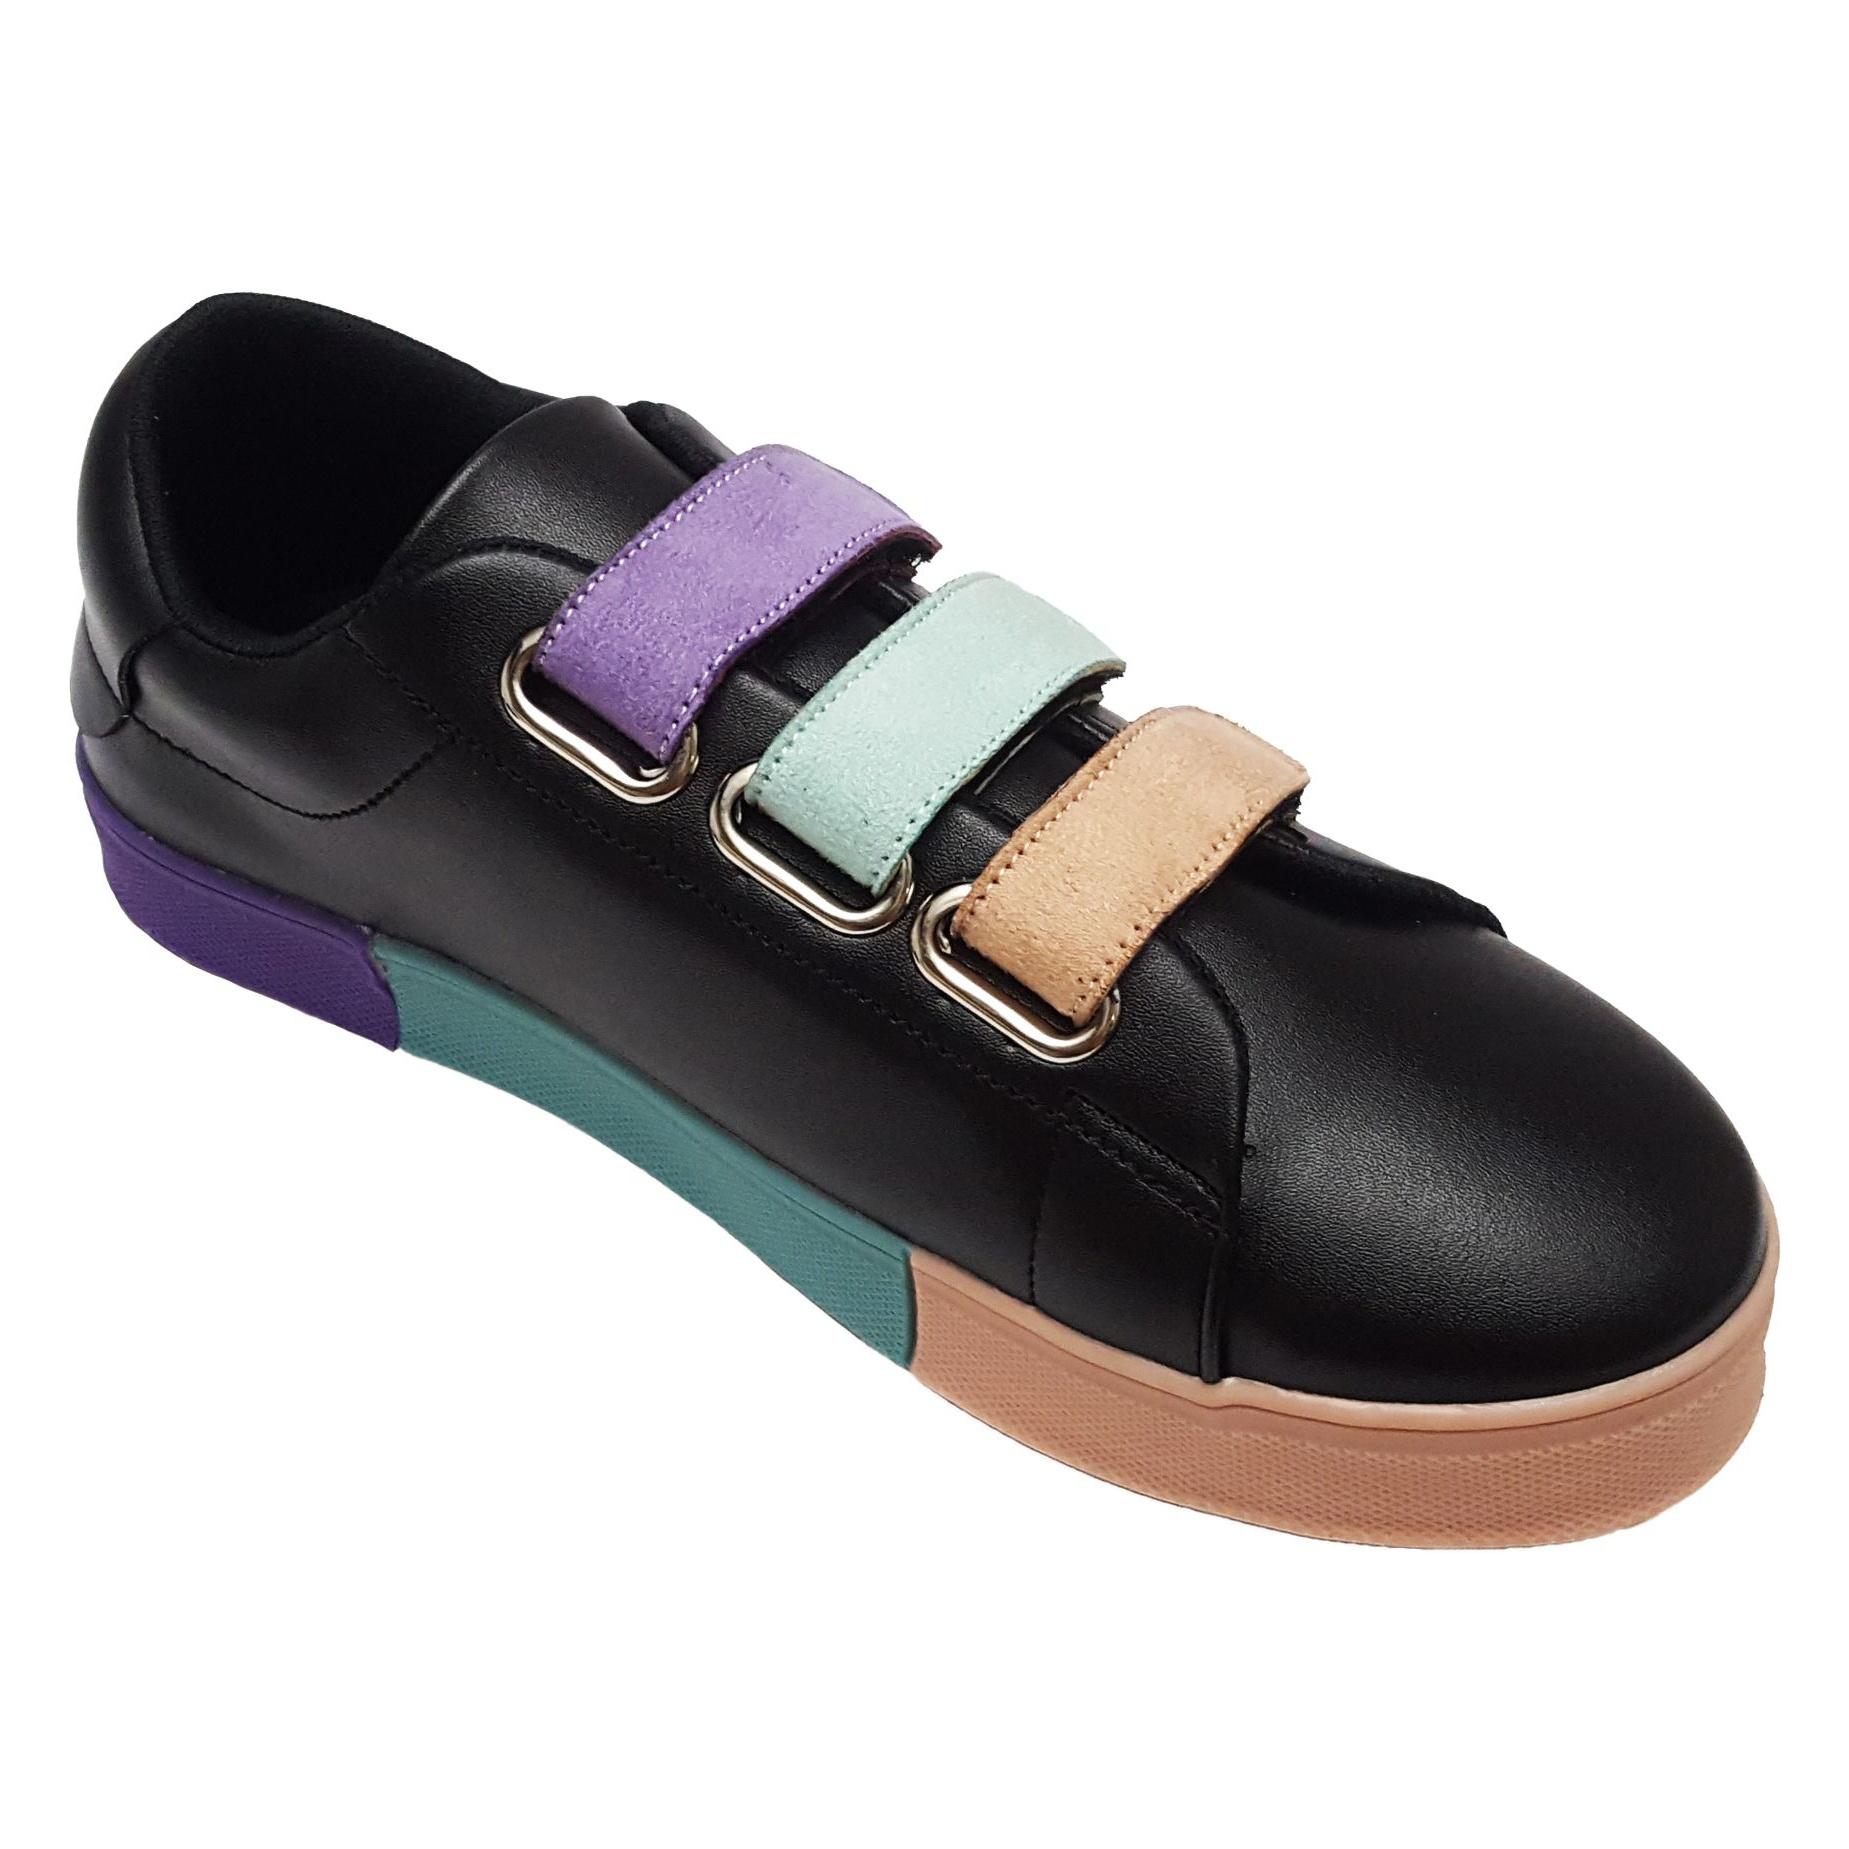 کفش مخصوص پیاده روی زنانه سون کالکشن کد K3